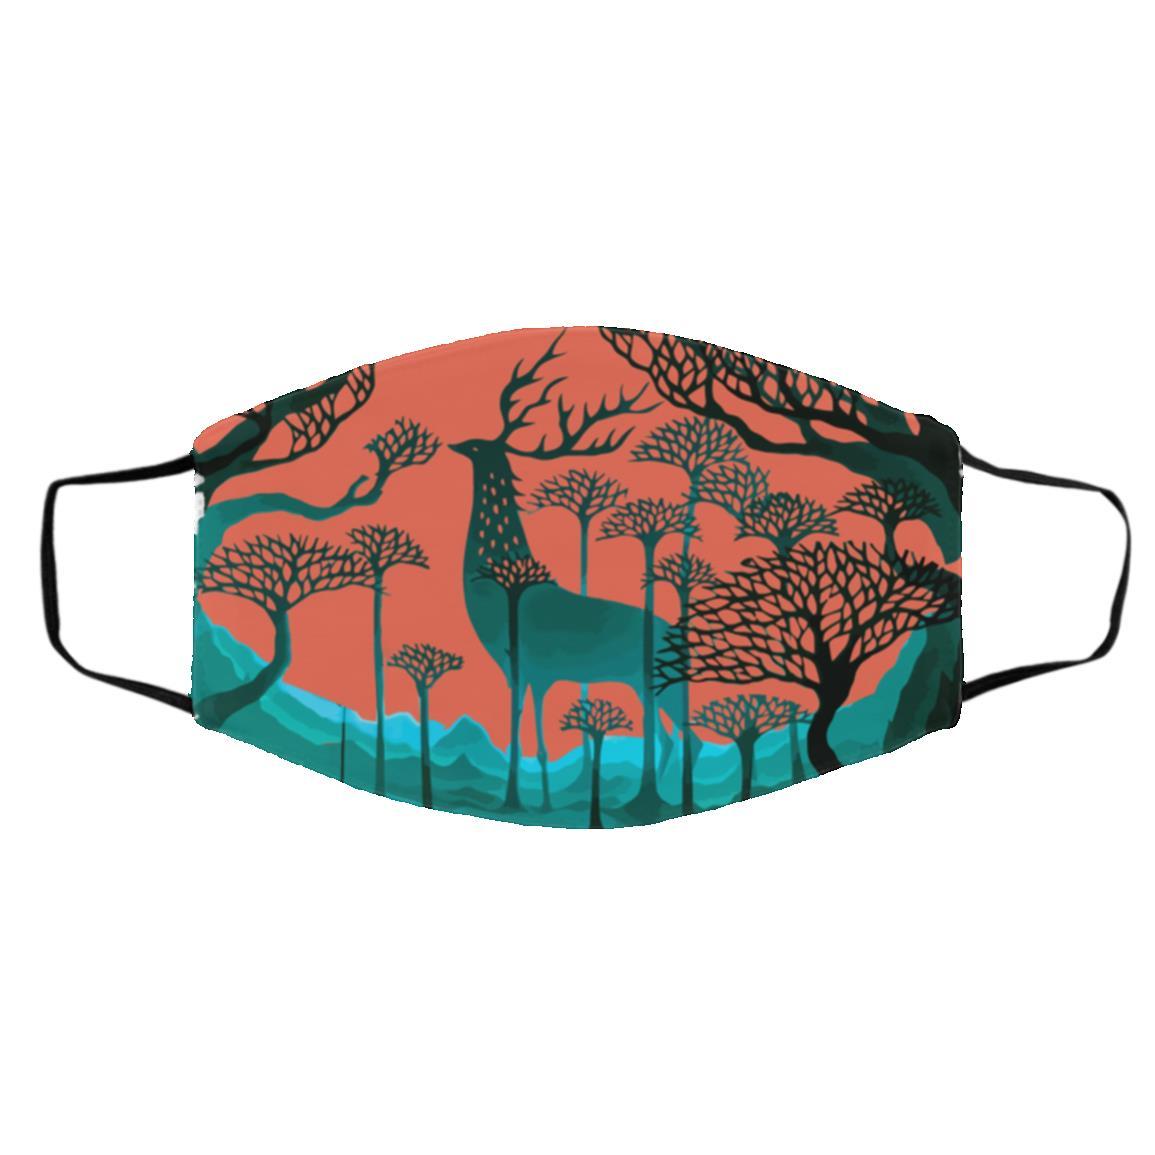 Princess Mononoke – Shishigami of The Forest Face Mask